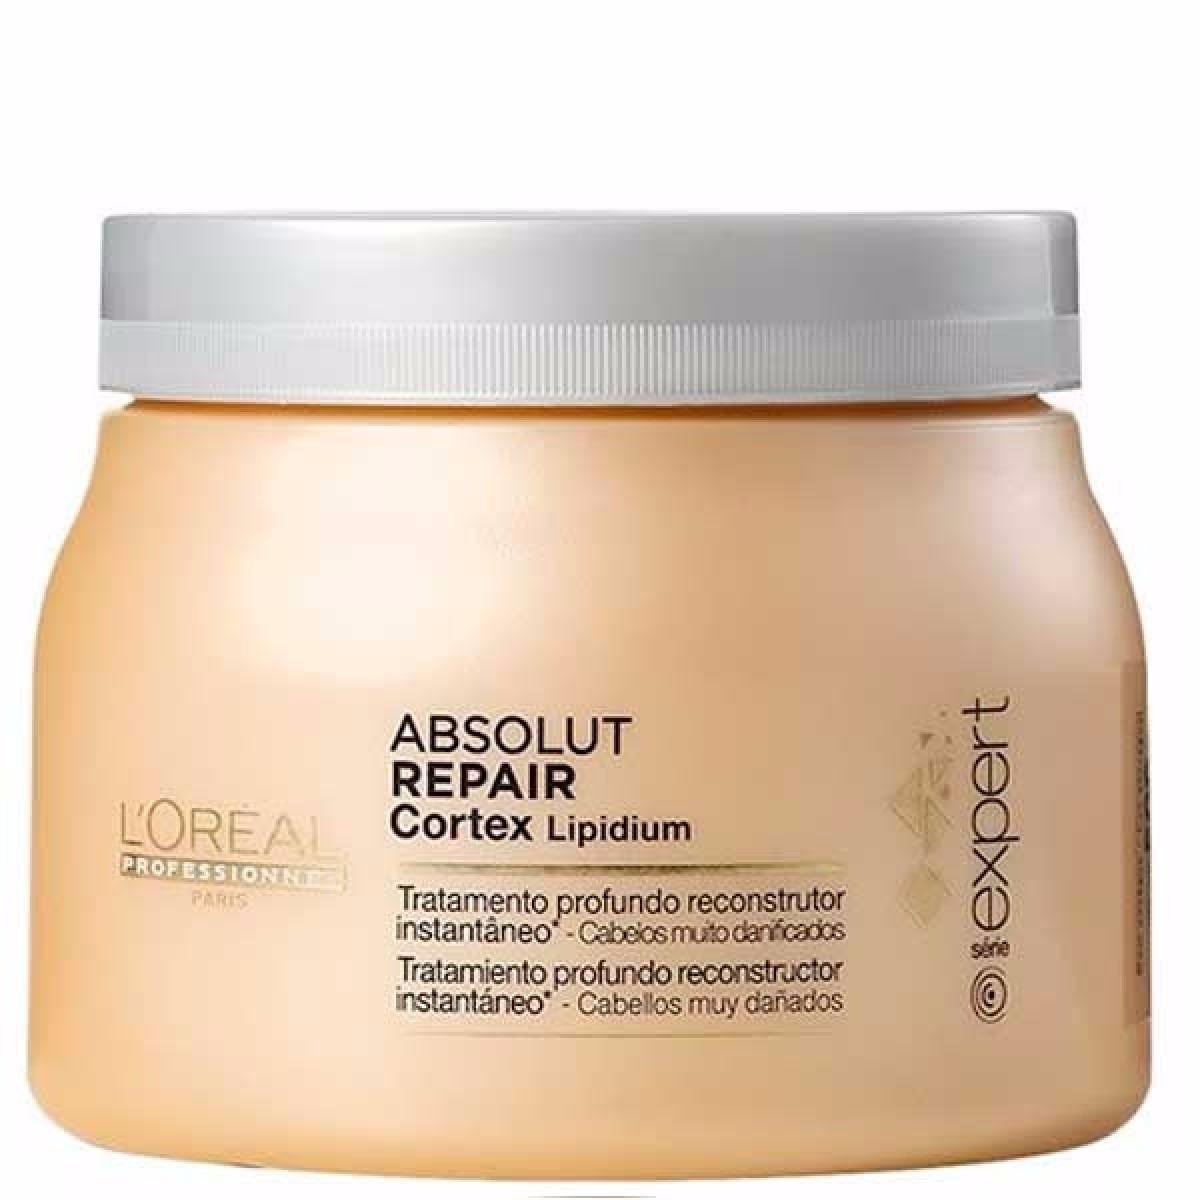 c9dc4d7b2 Máscara Loréal Absolut Repair Cortex Lipidium 500g Promoção - R$ 184 ...